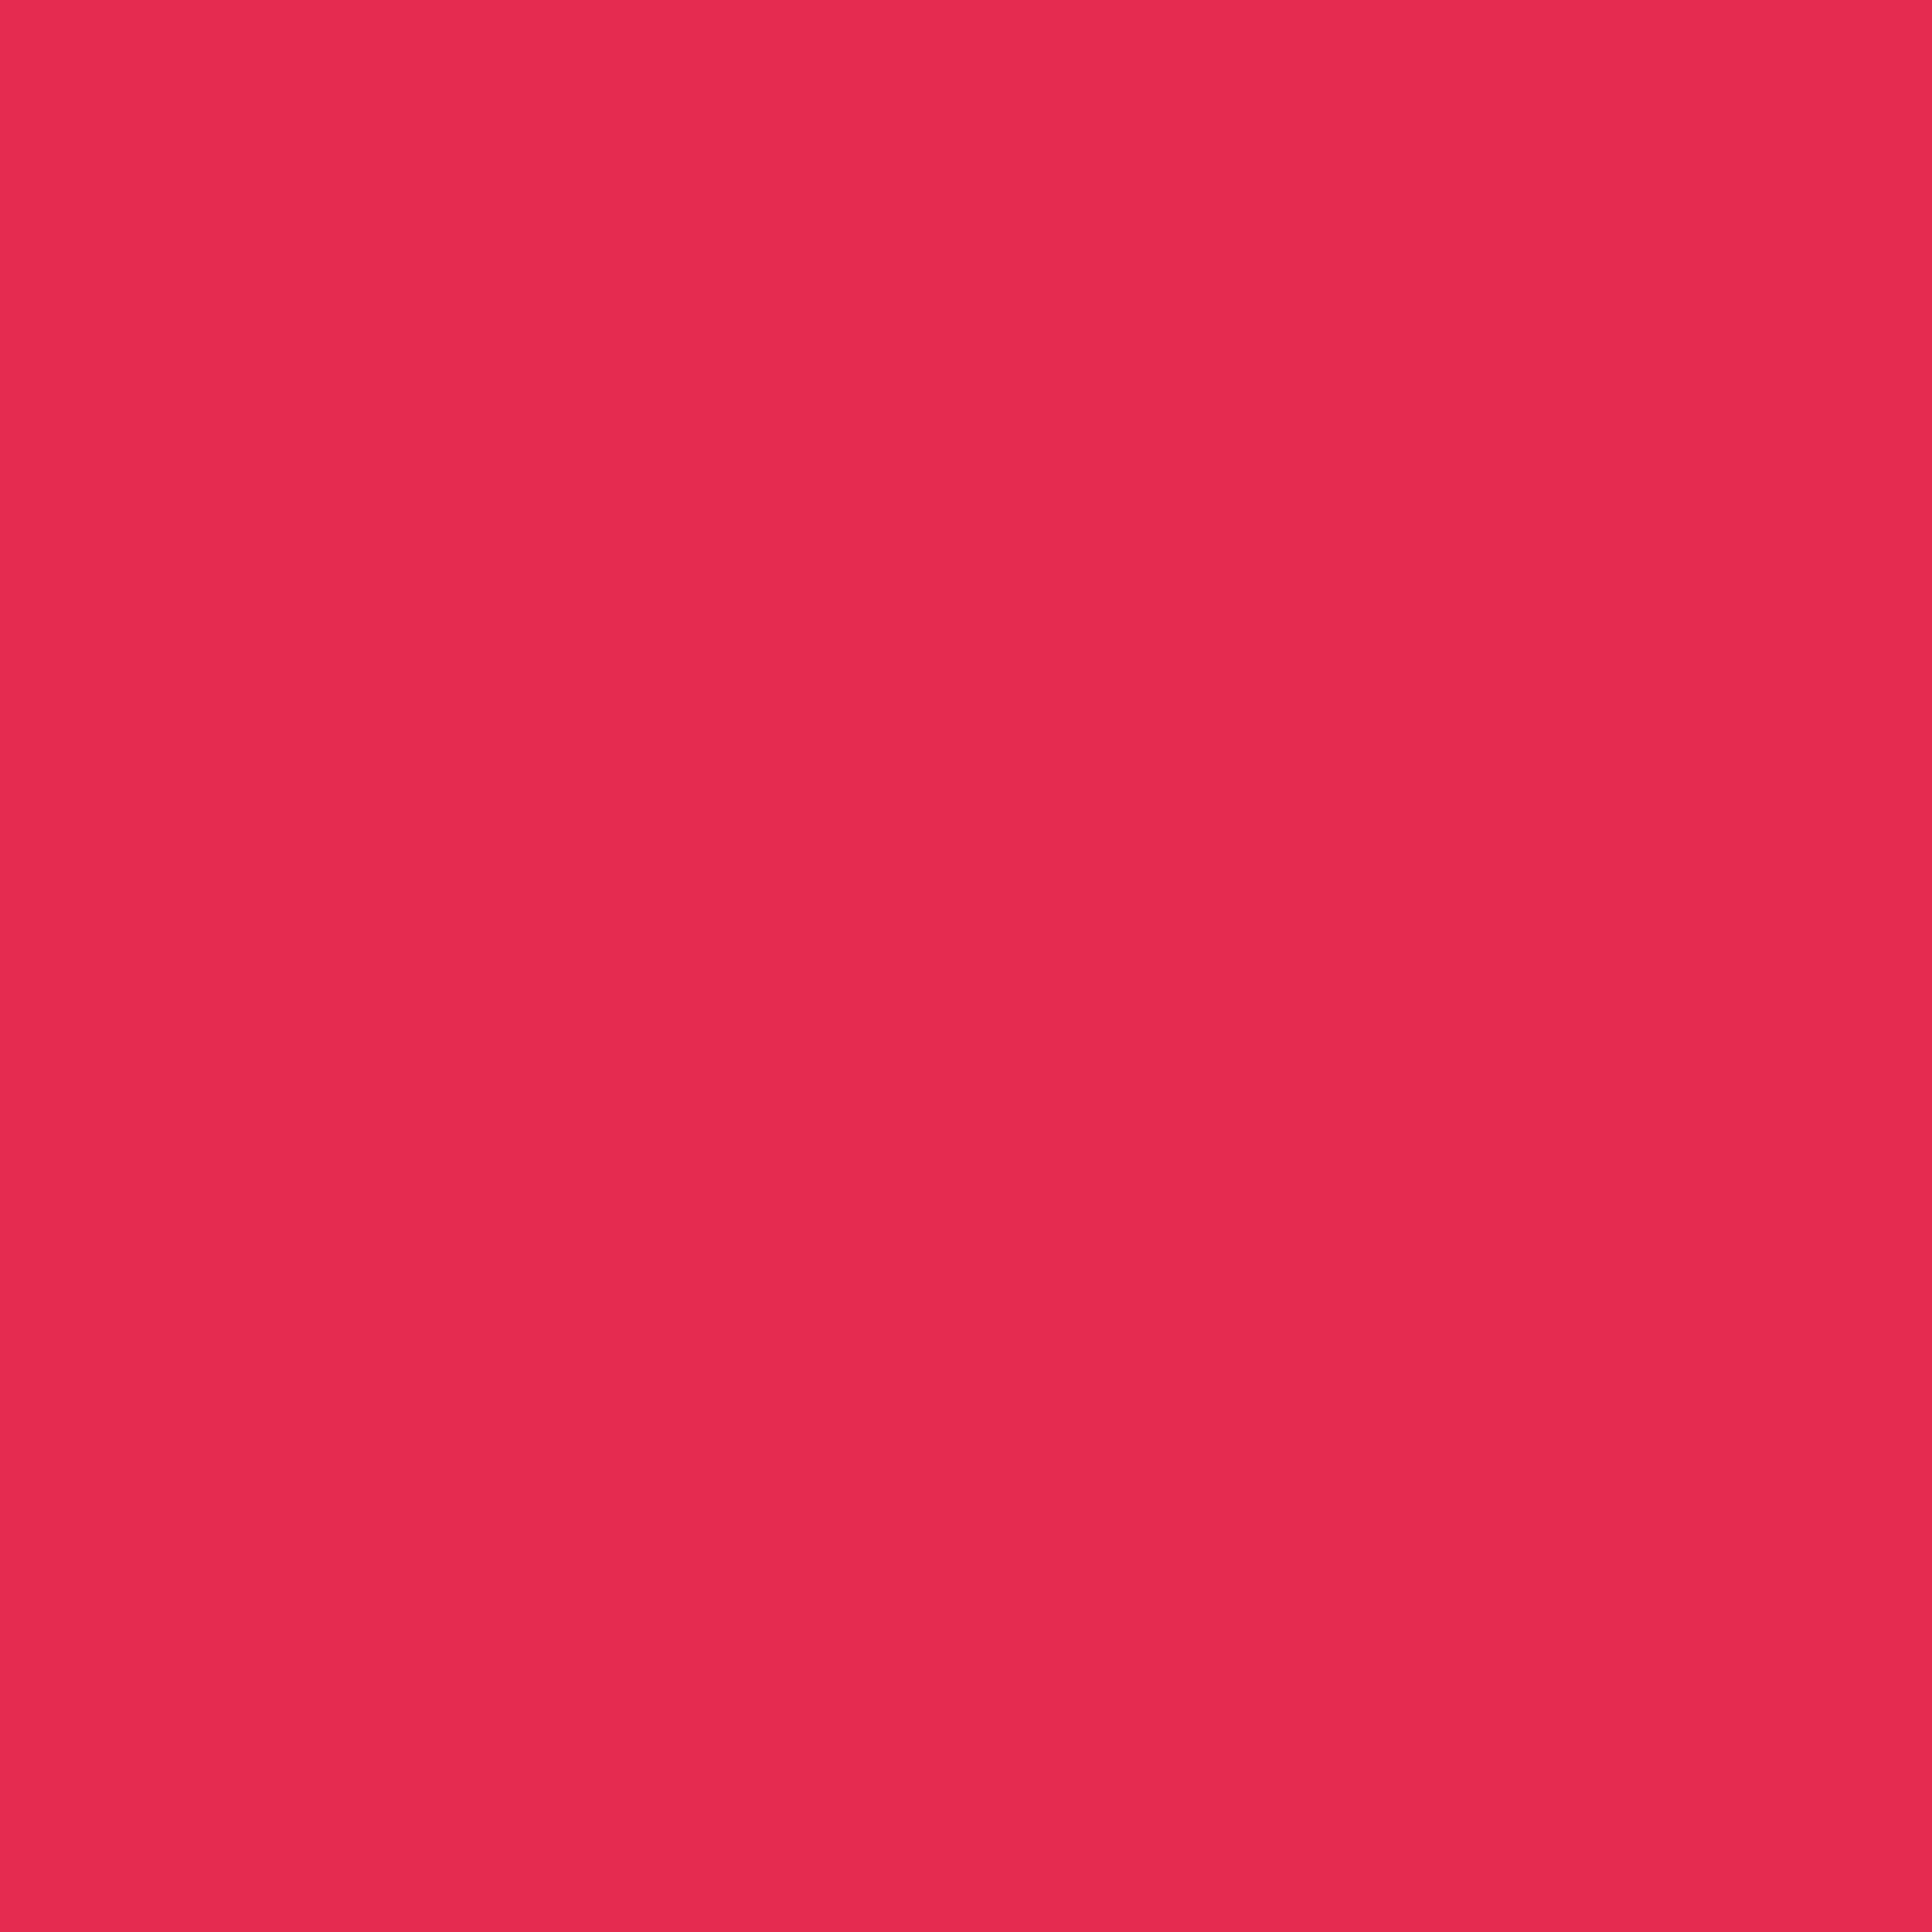 2732x2732 Amaranth Solid Color Background